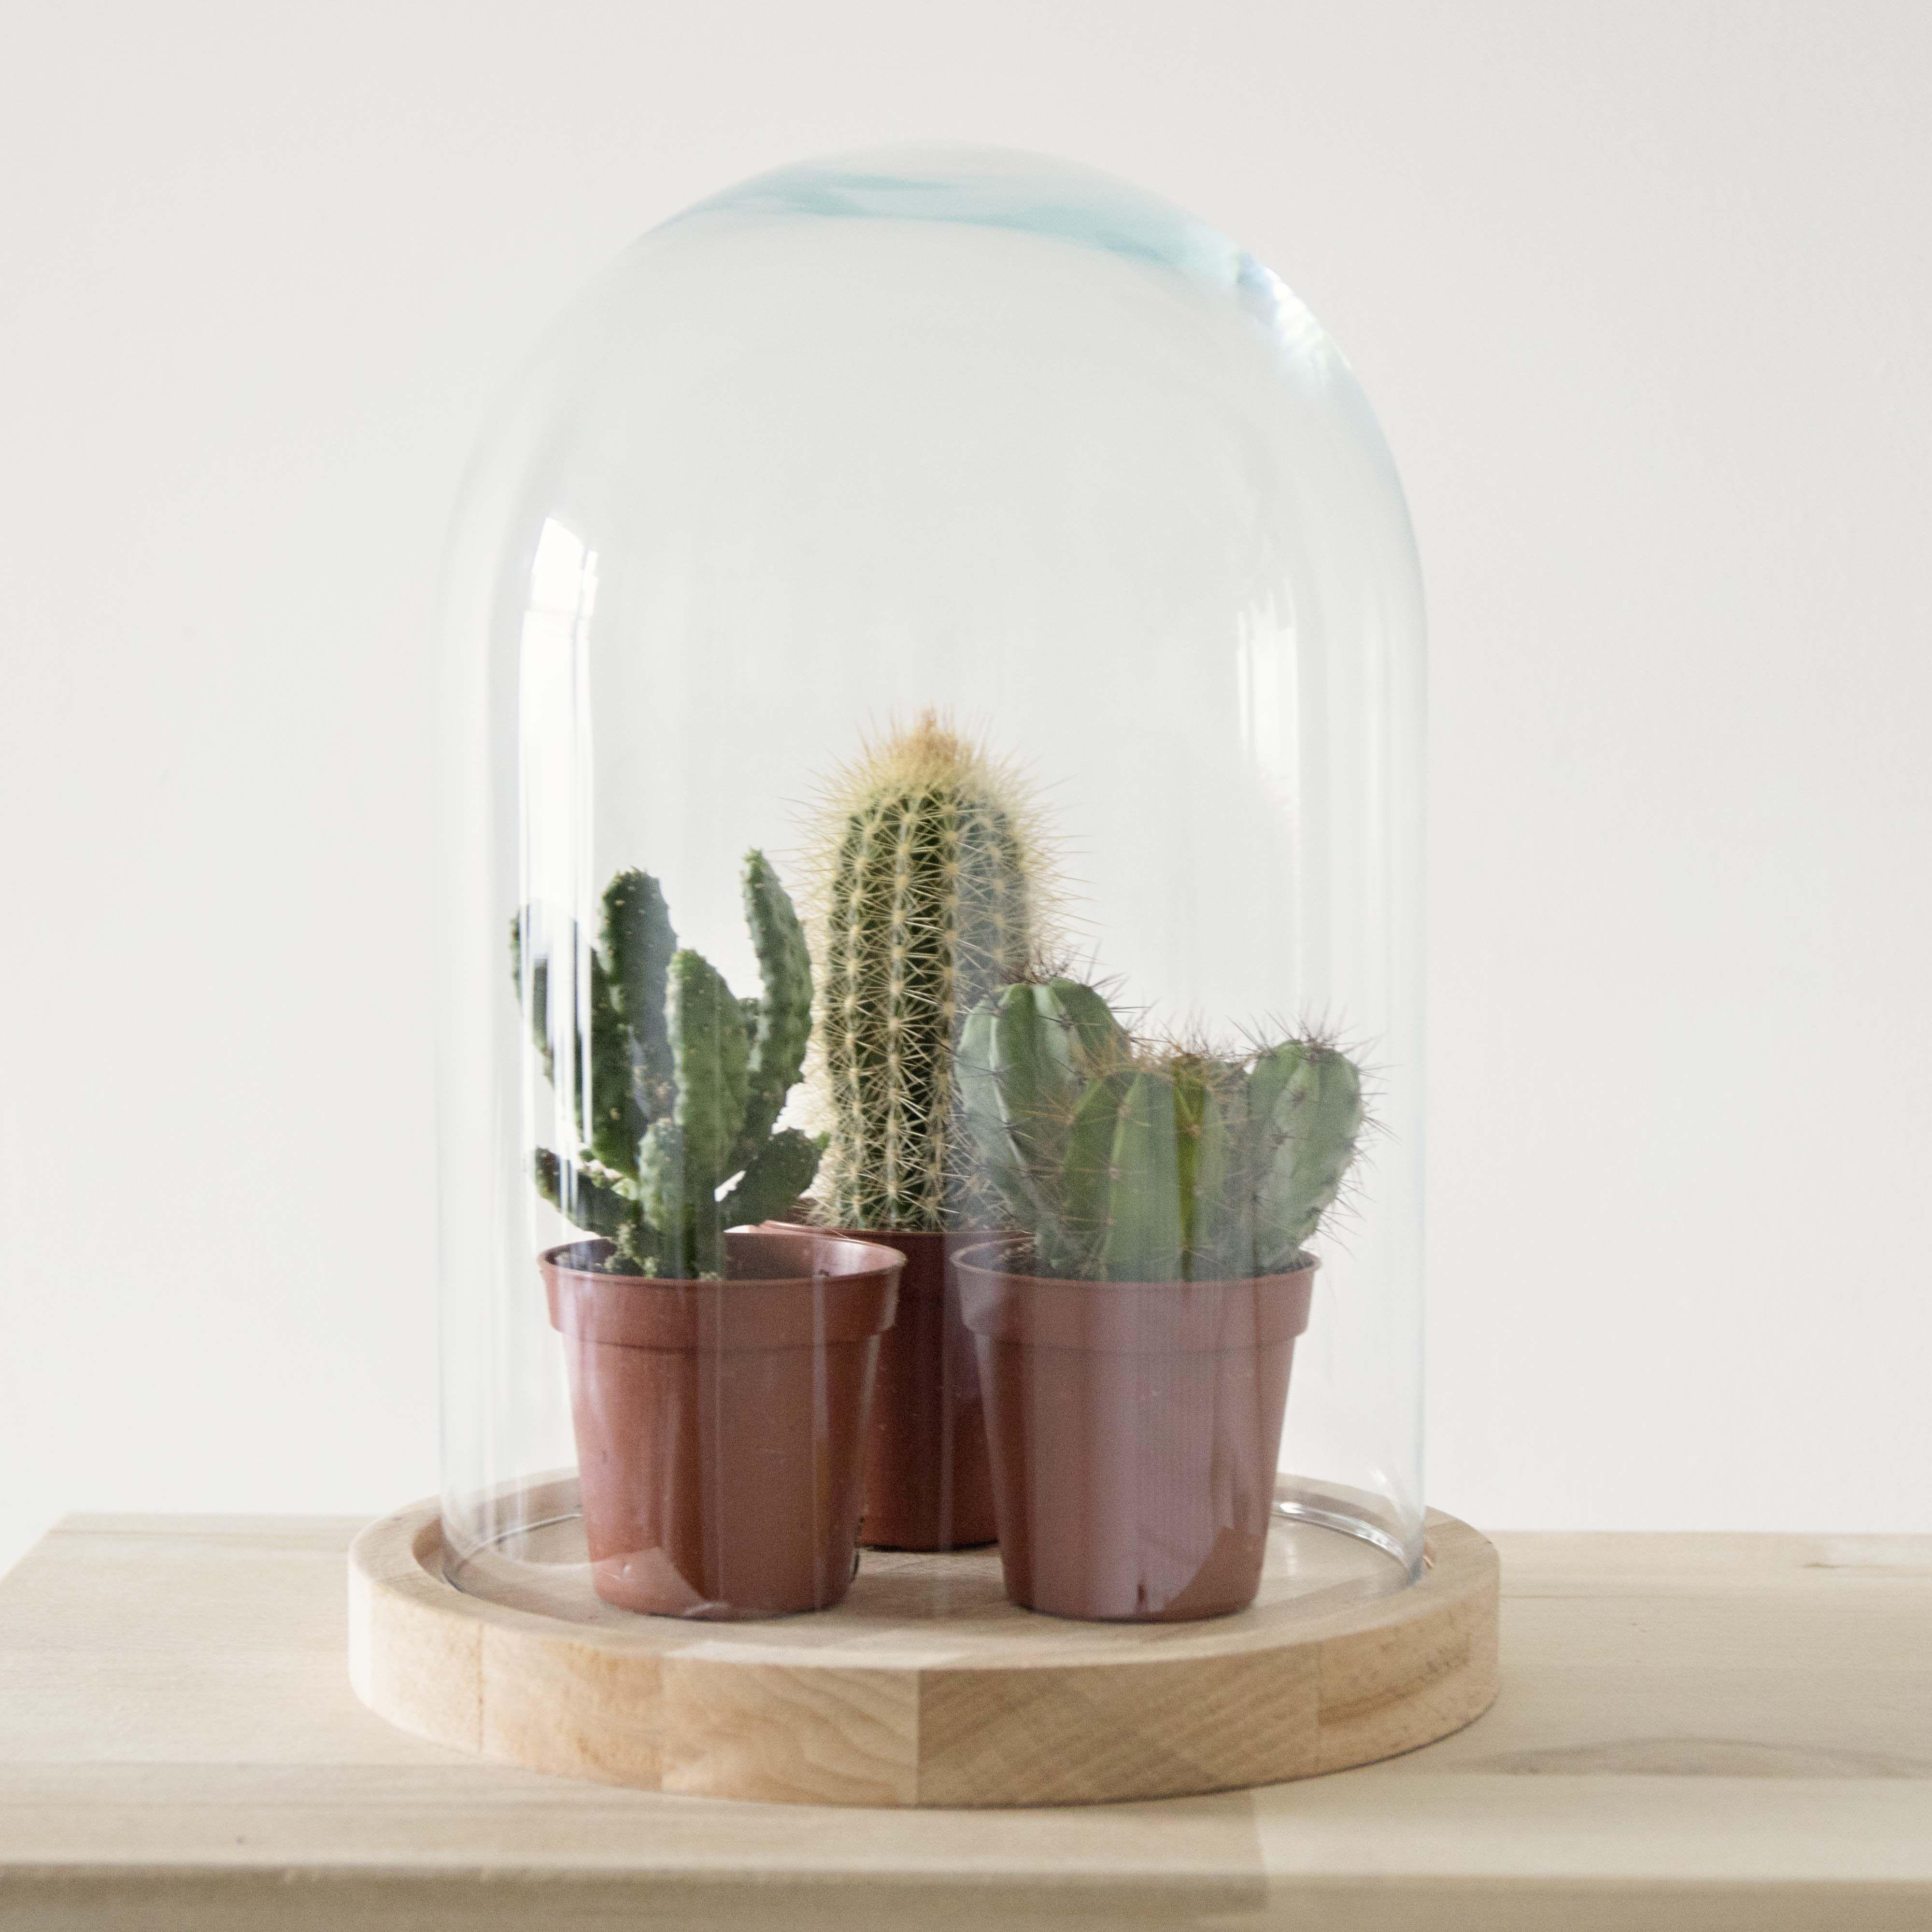 stolp met kleine cactus palace dreams in 2018. Black Bedroom Furniture Sets. Home Design Ideas